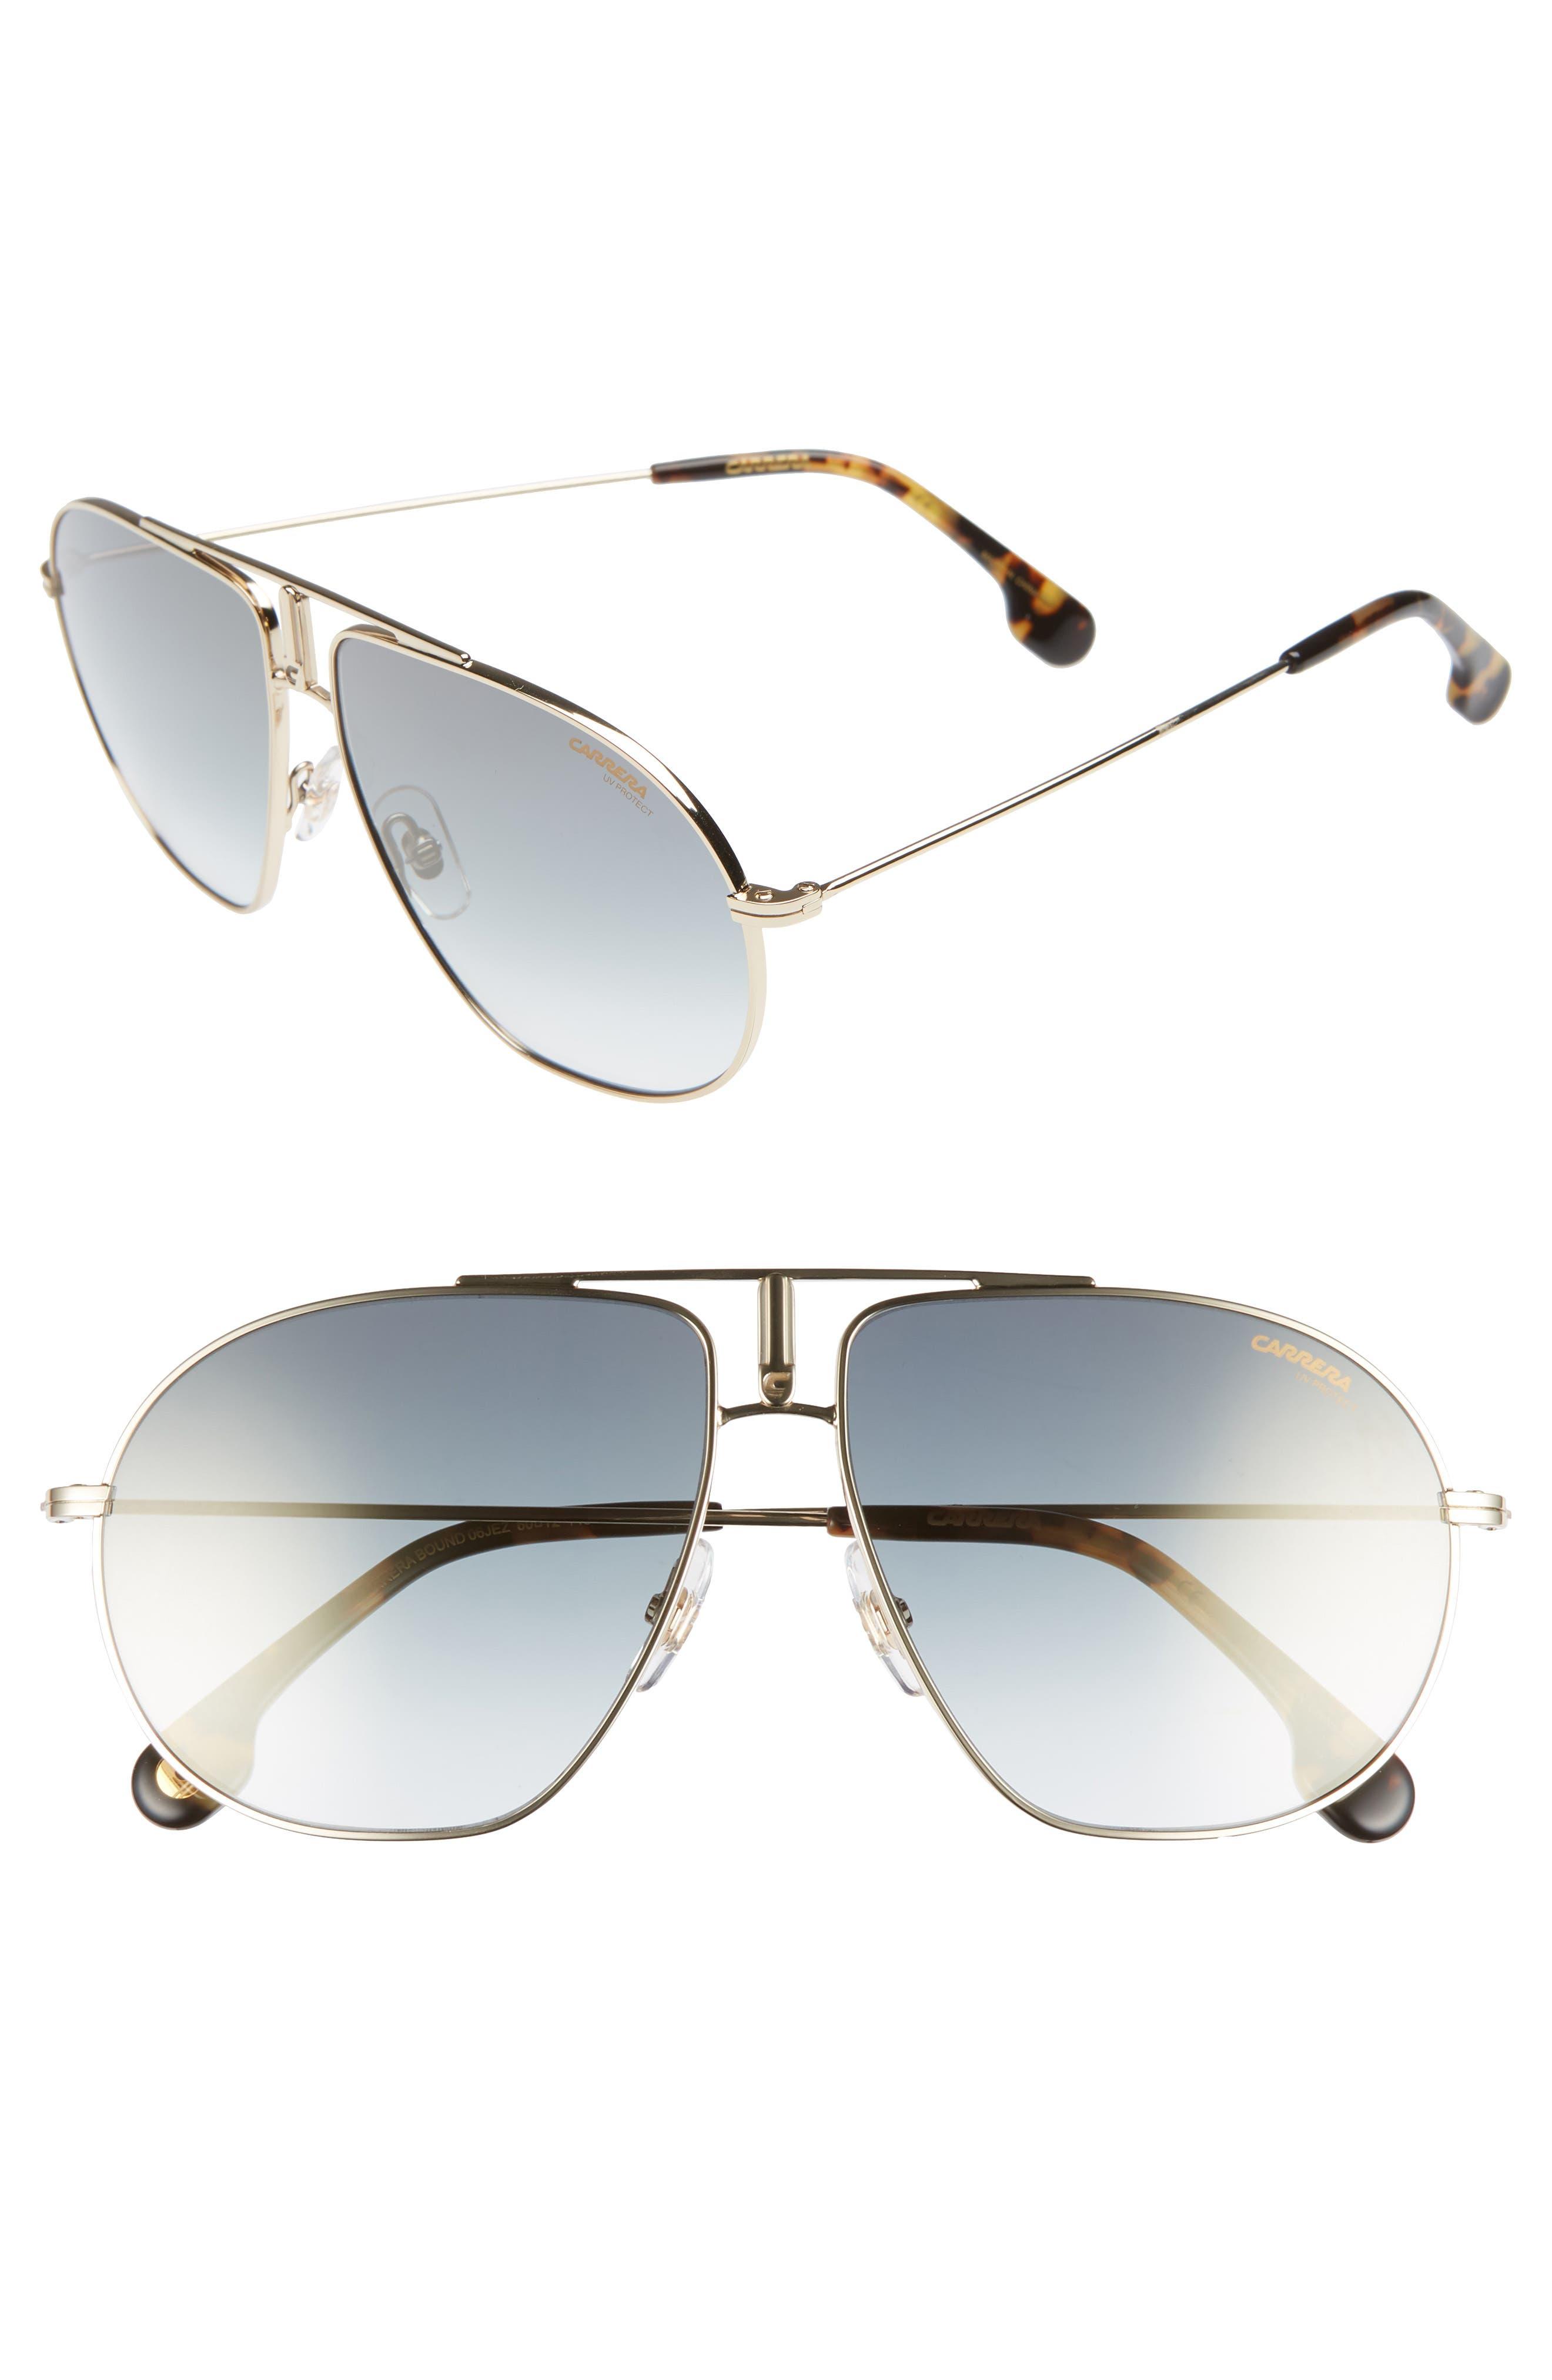 Carrera Eyewear Bounds 60Mm Gradient Aviator Sunglasses - Gold